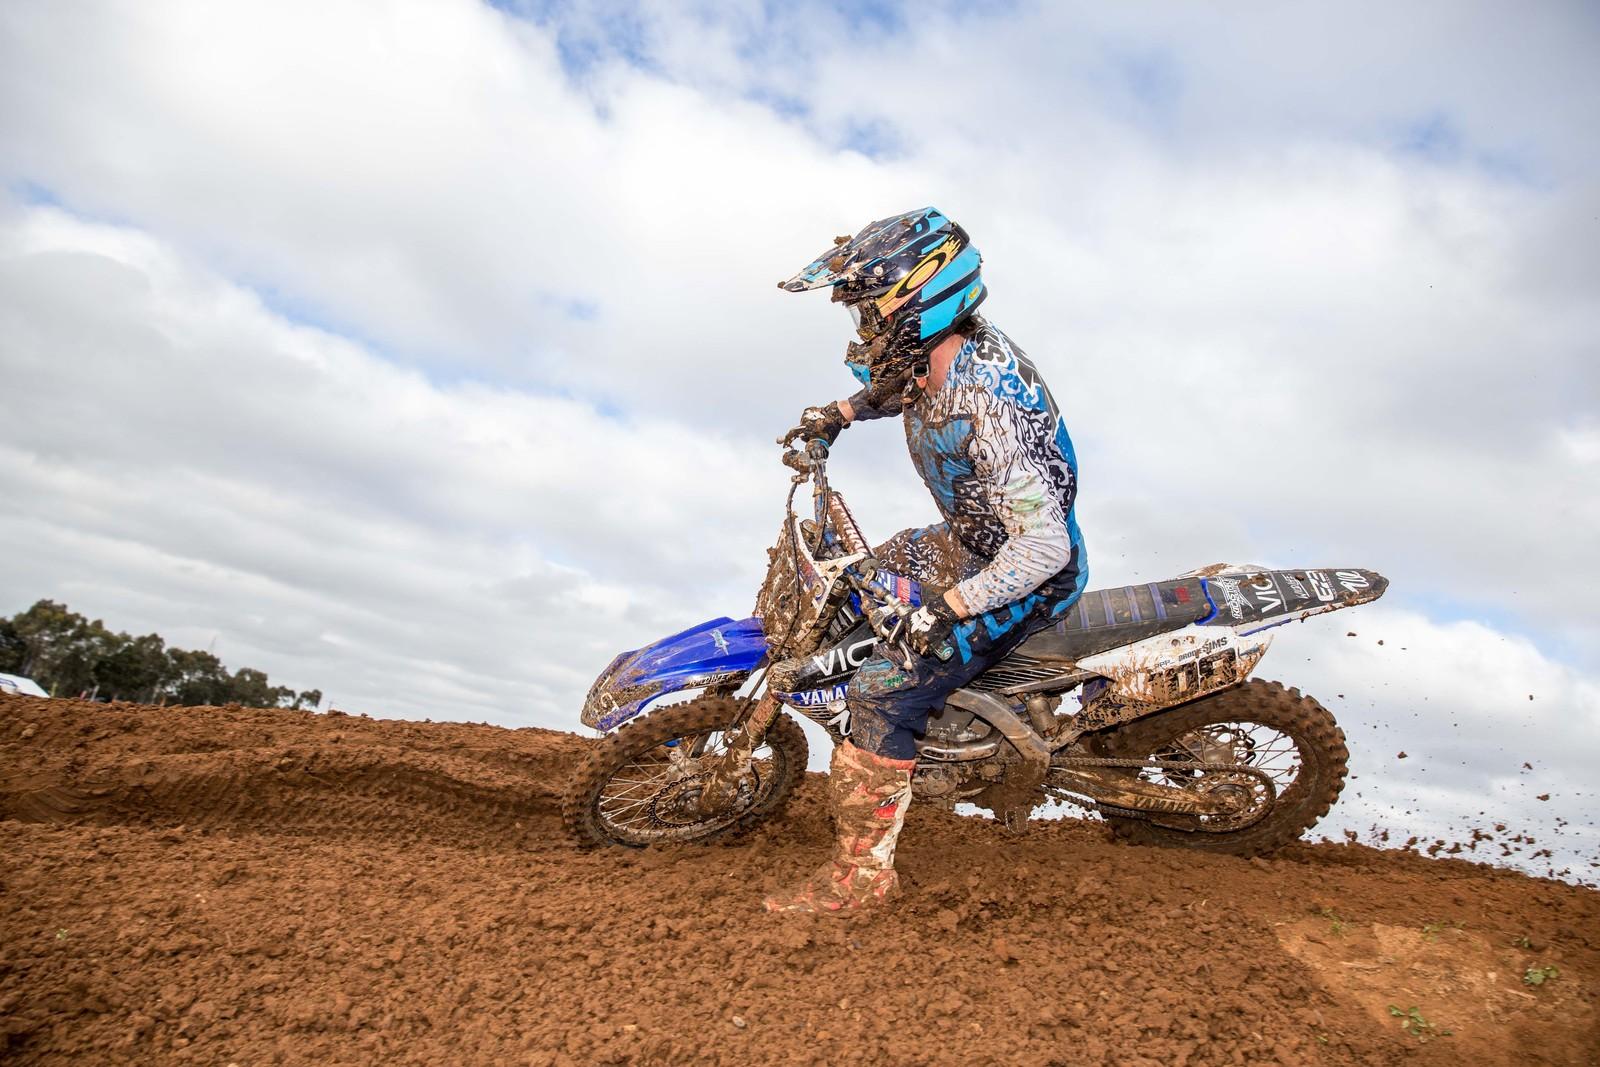 Brodie Sims - Australian Motul MX Championships: Round 8, Shepparton - Motocross Pictures - Vital MX